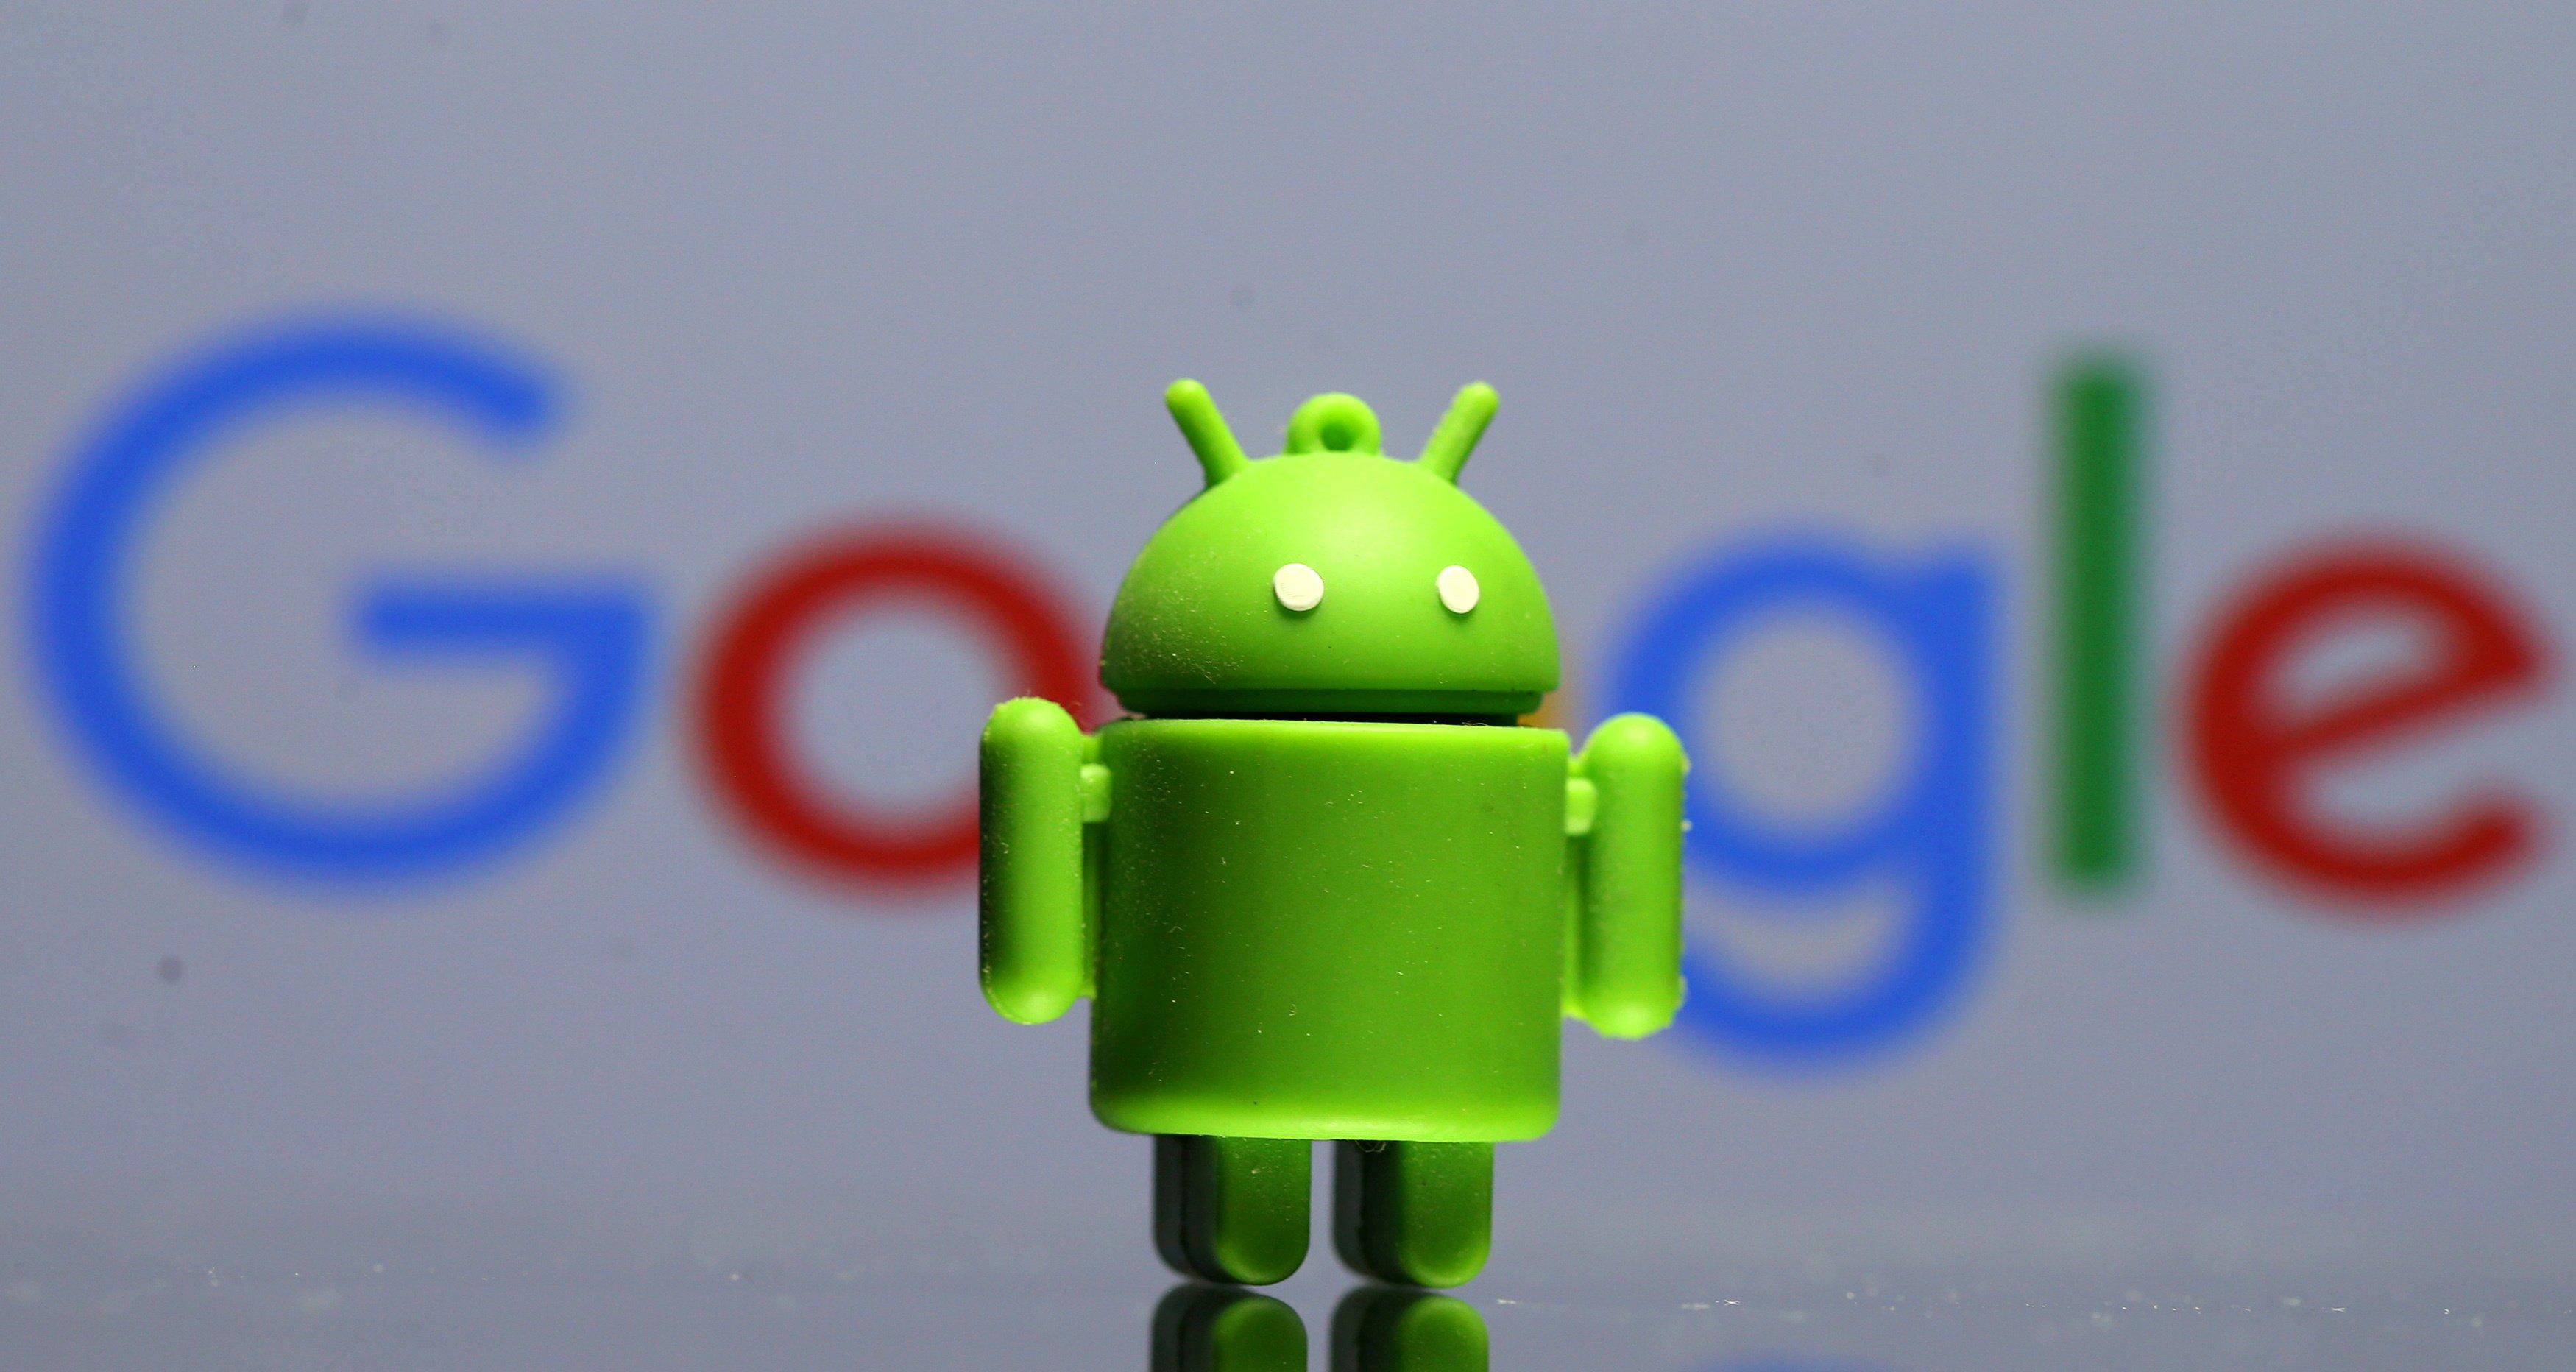 Google выпустил новую версию Android - Android 10